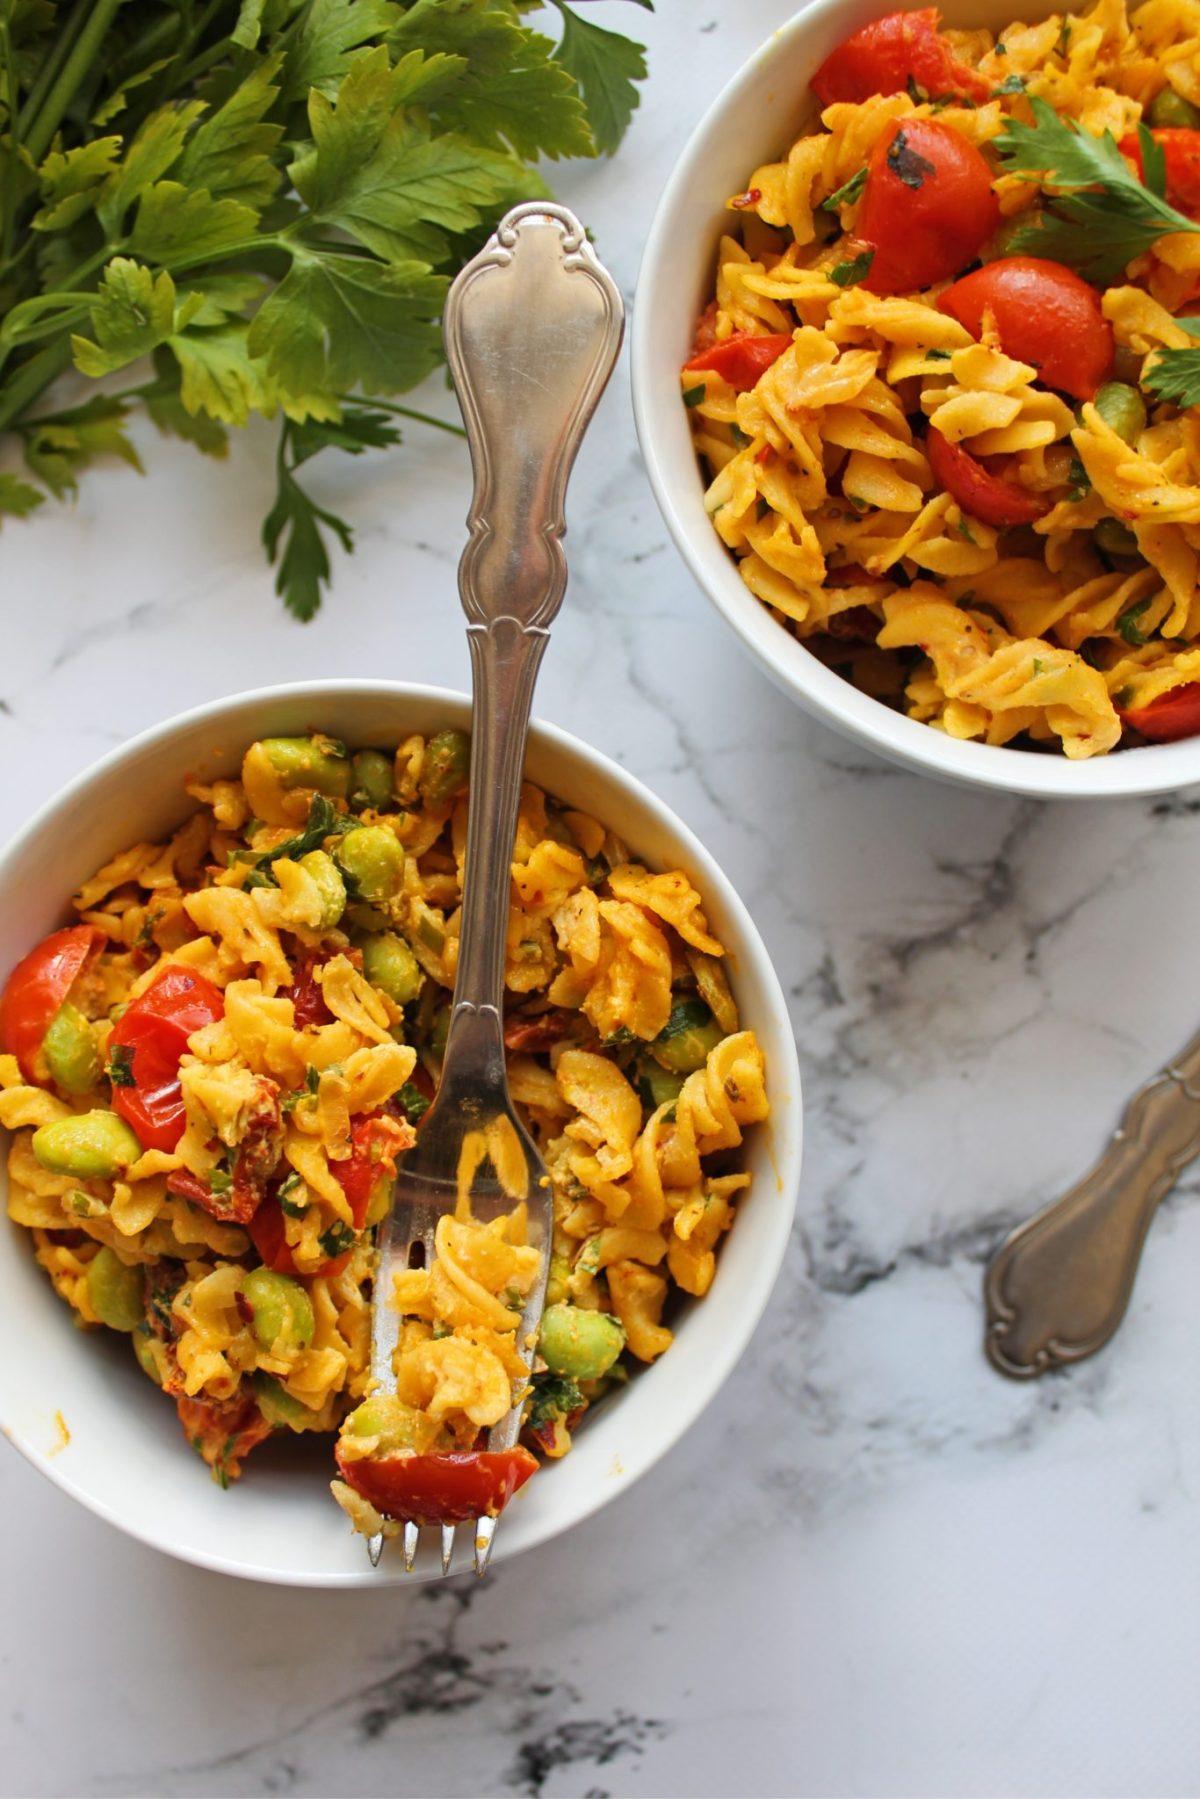 Vegansk pastaret med edamame, tomat og soyafløde